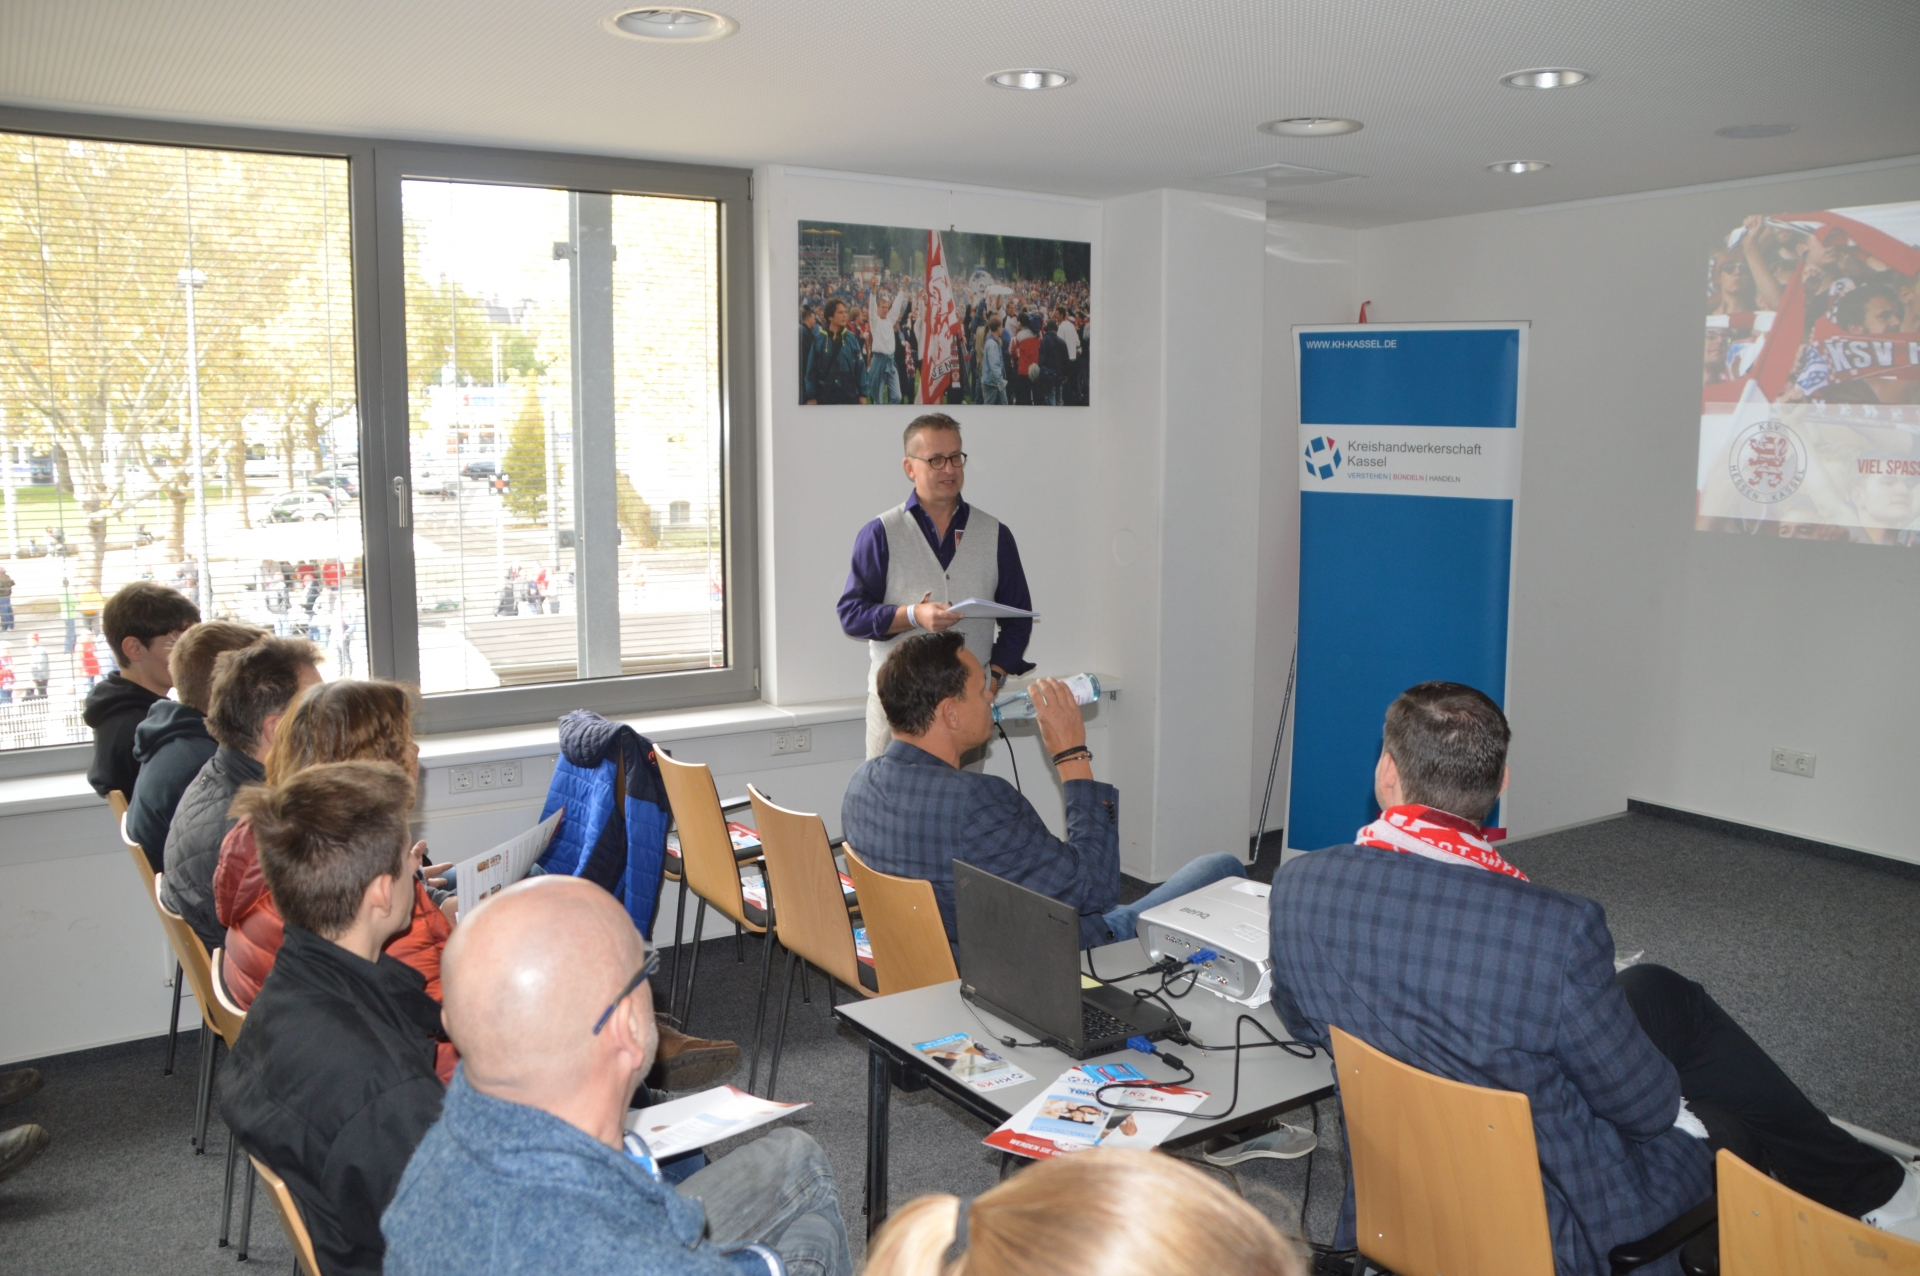 TOPAS Azubibegrüßung mit Kreishandwerkerschaft Kassel